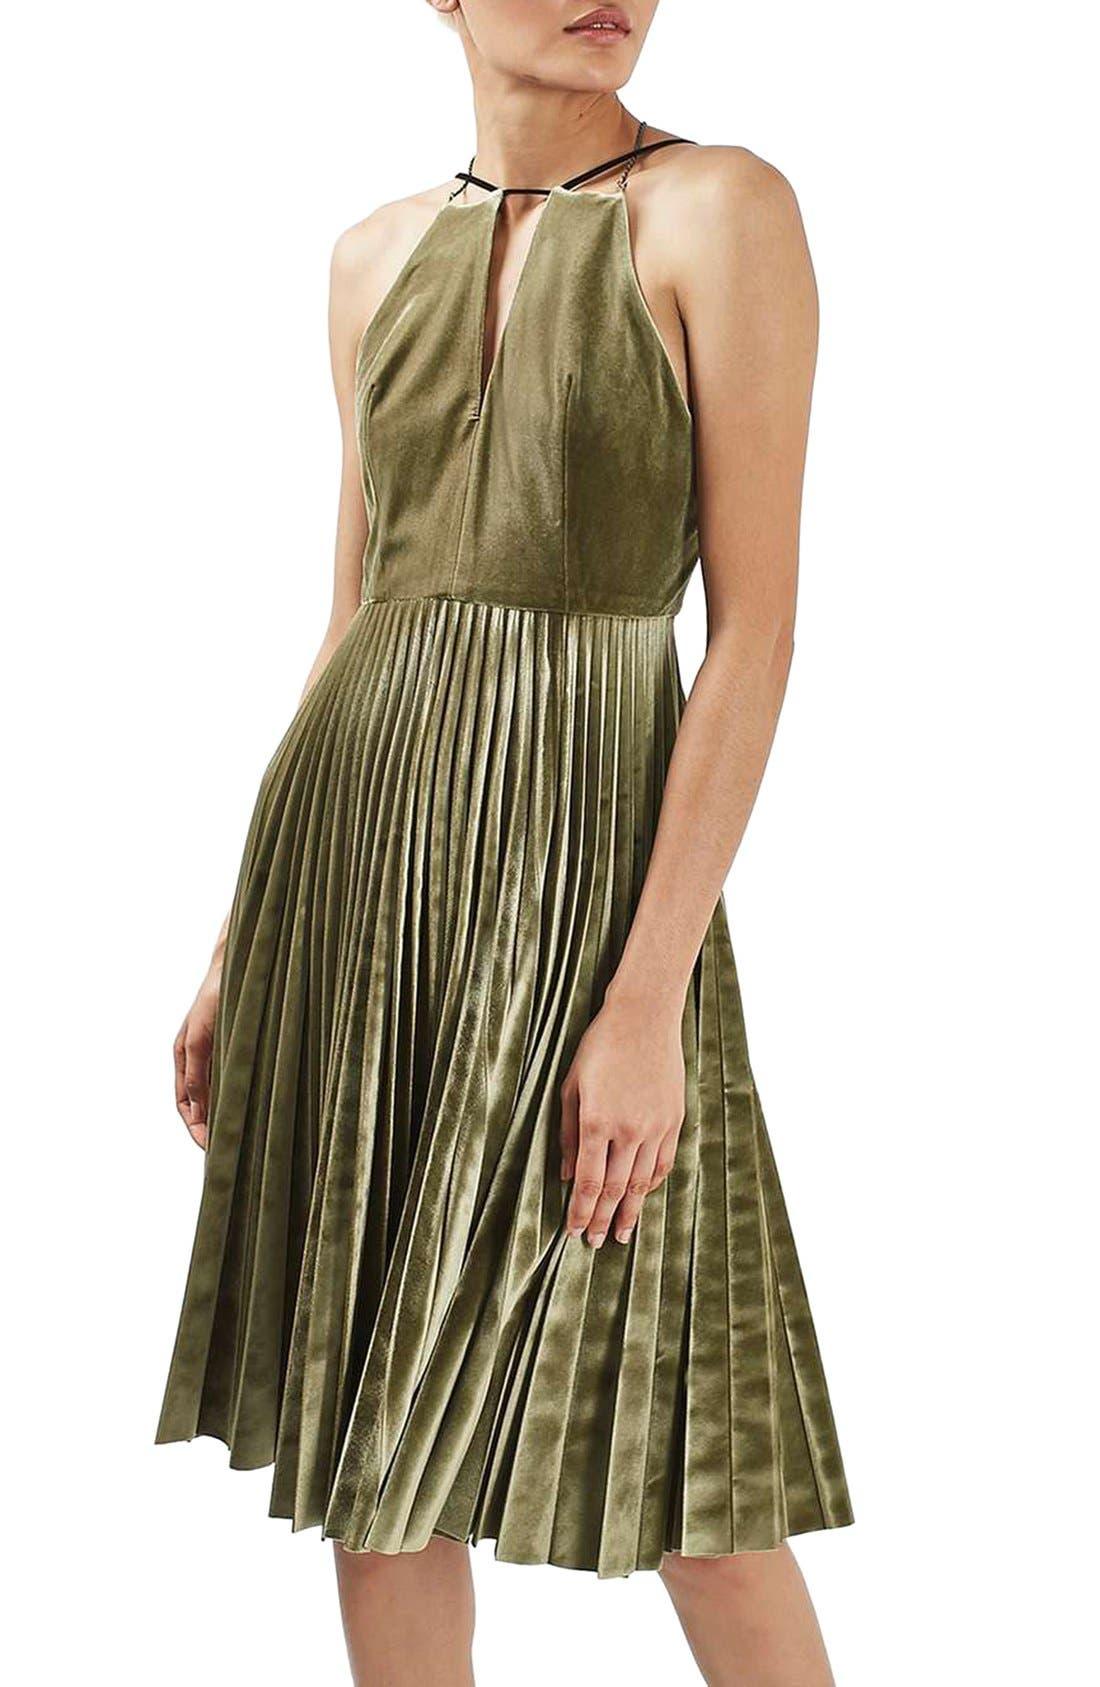 Alternate Image 1 Selected - Topshop Pleated Velvet Fit & Flare Dress